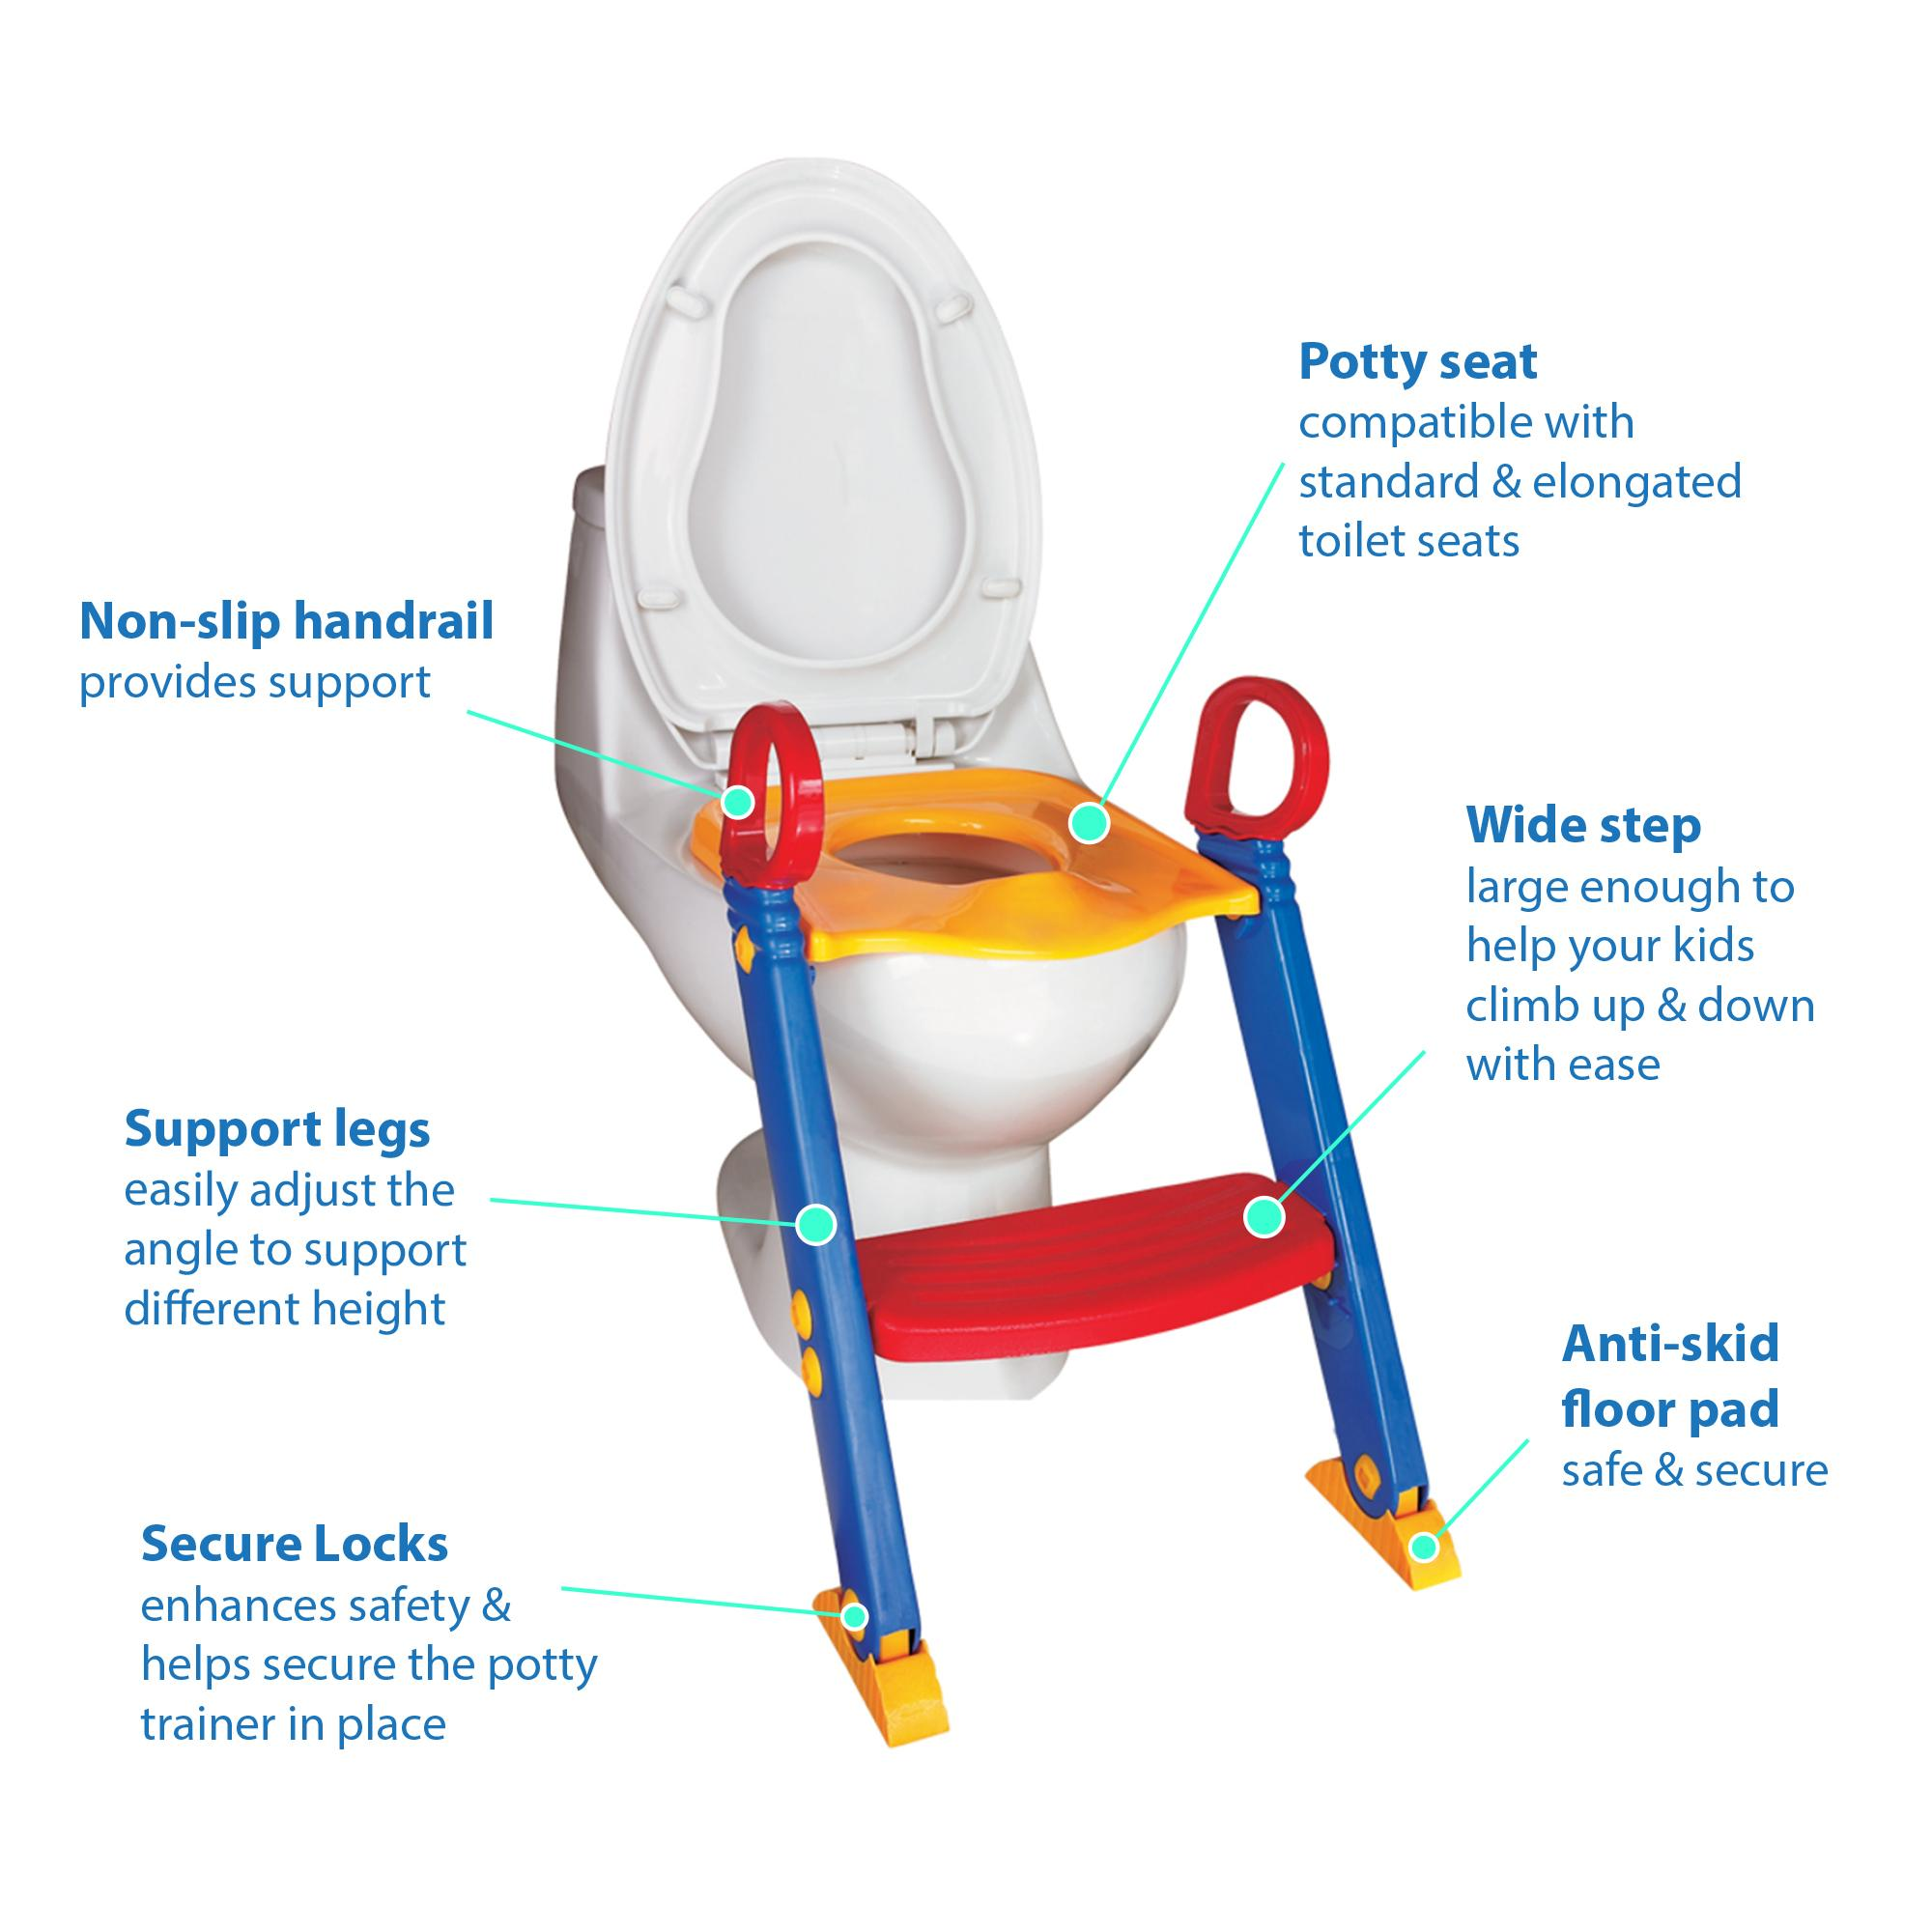 potty training potty training seat toilet trainer toilet training step up potty  sc 1 st  Amazon.com & Amazon.com: Chummie Joy 6 In 1 Portable Potty Training Ladder Step ... islam-shia.org